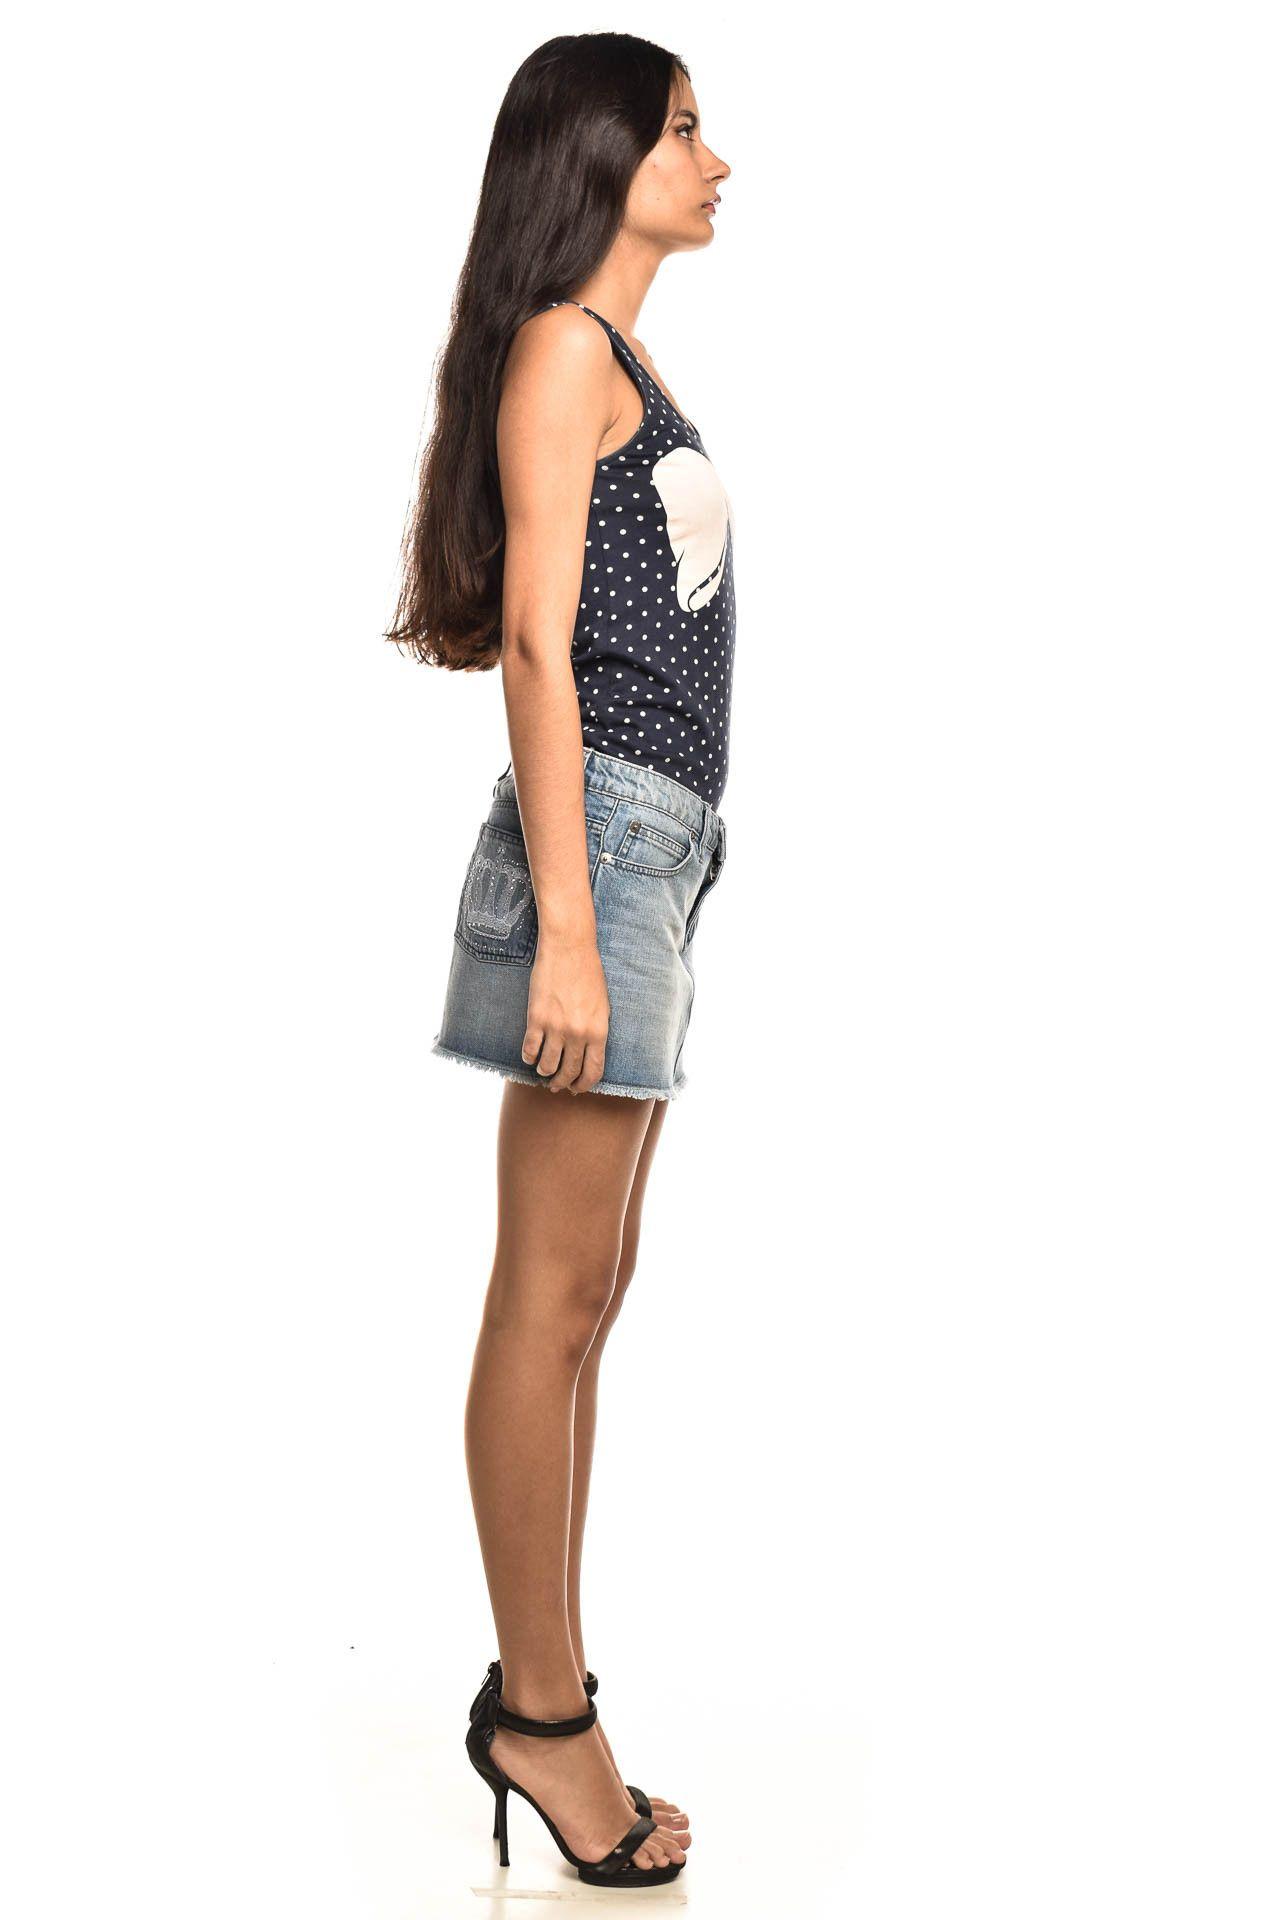 Shop 126 - Saia Jeans Azul - Foto 4